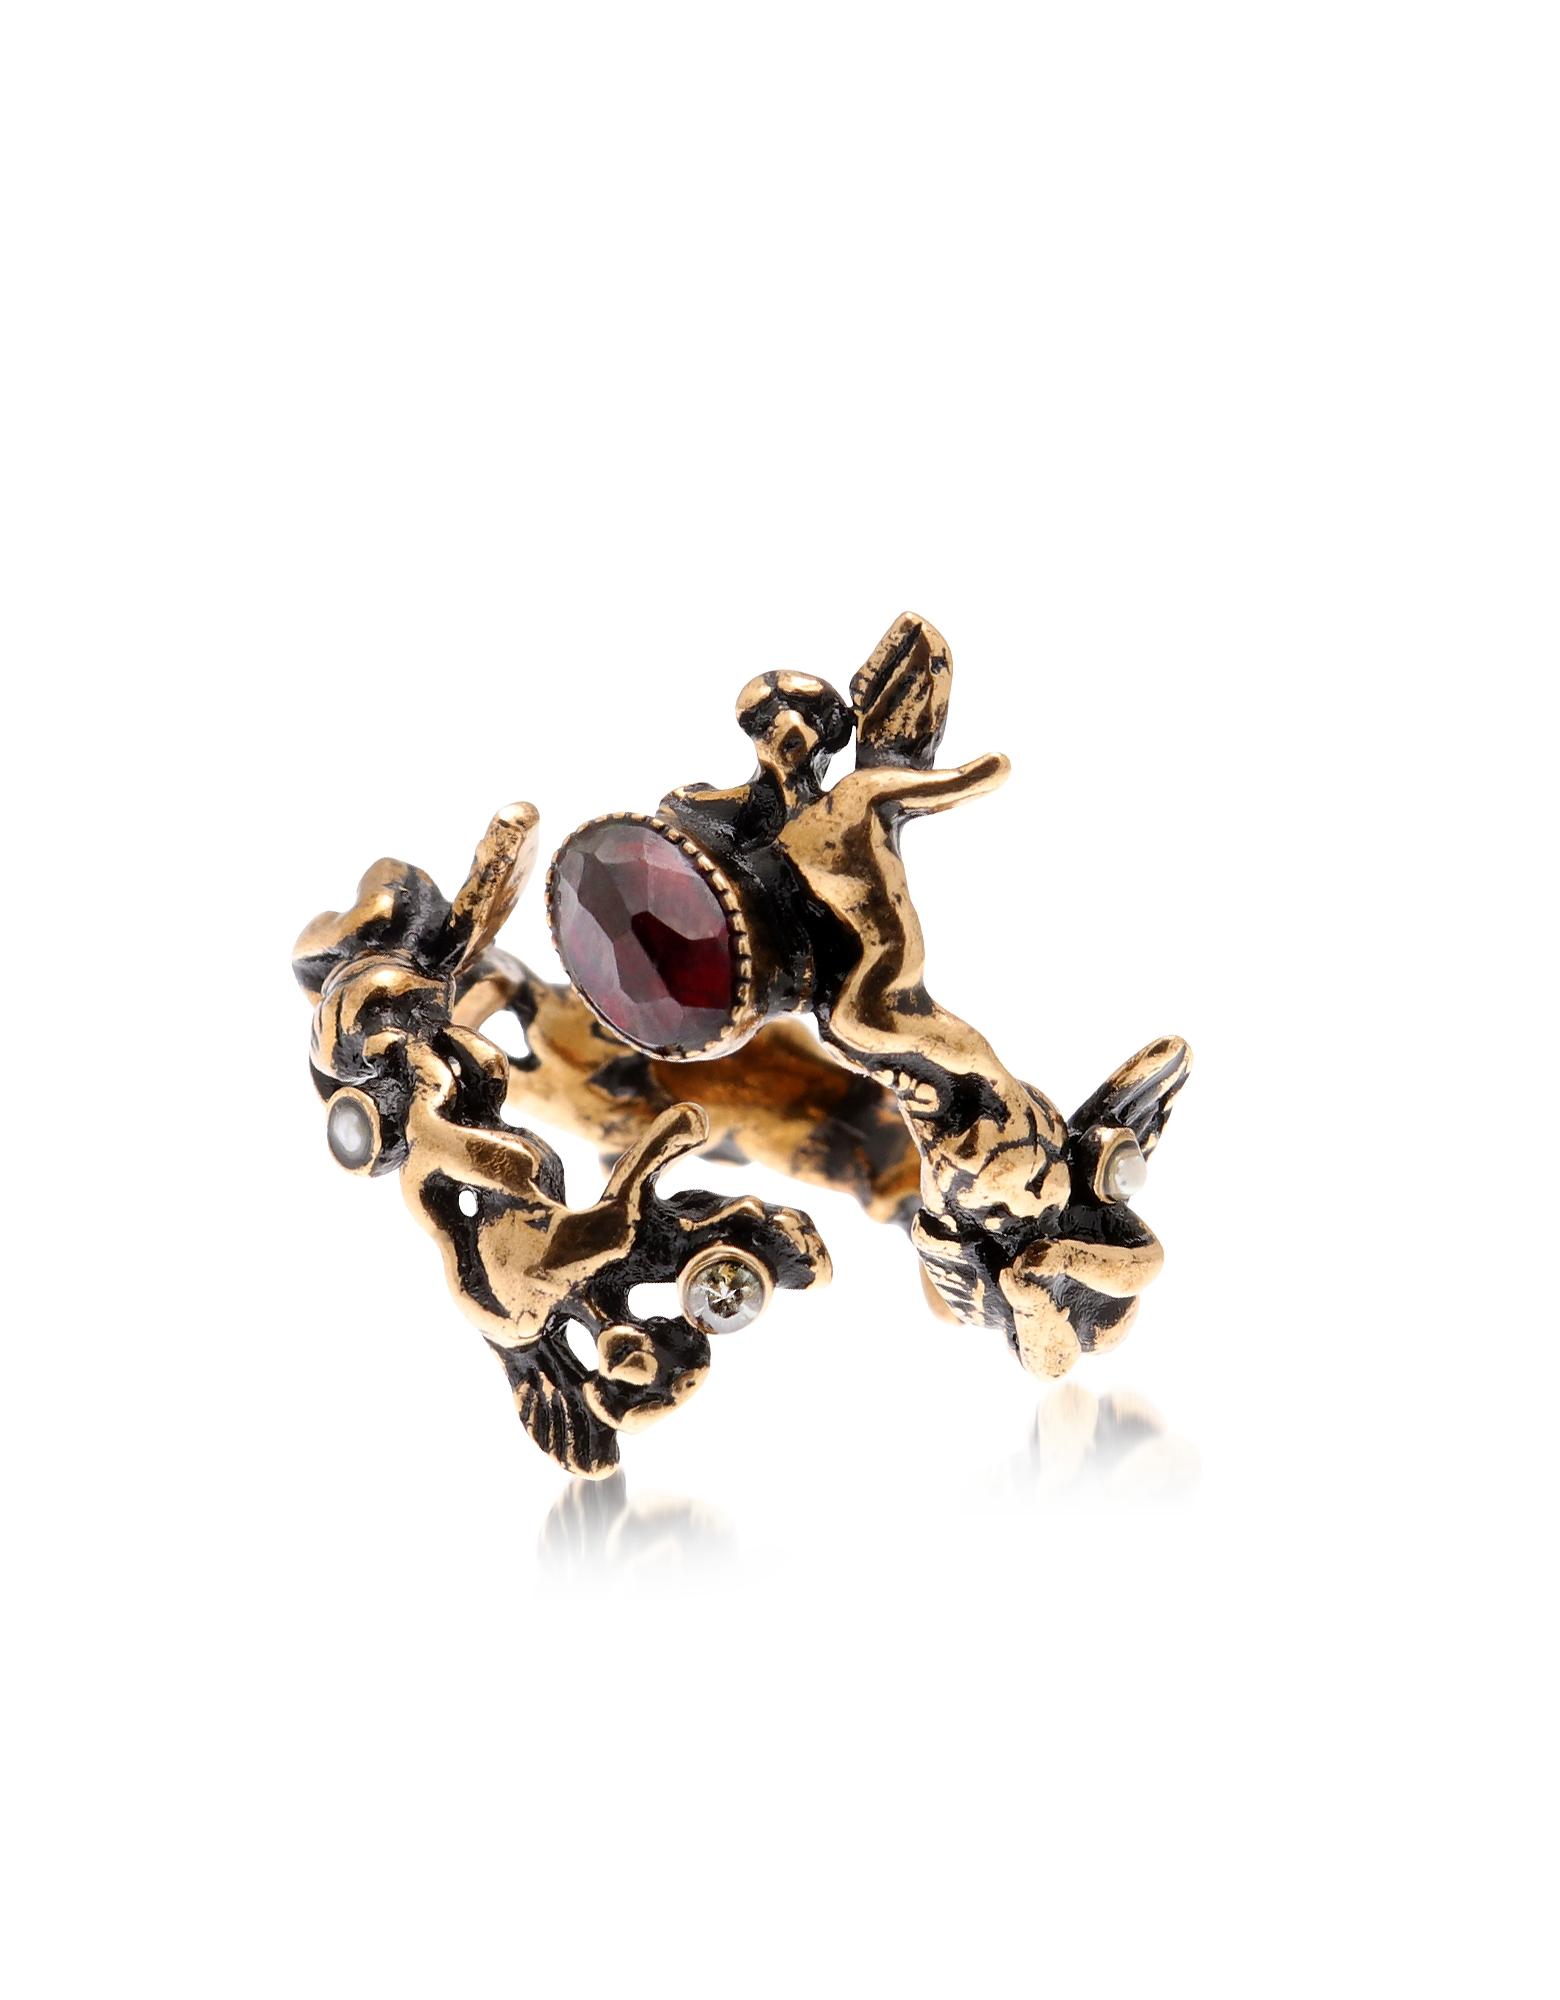 Amorino Golden Brass Ring w/Gemstones